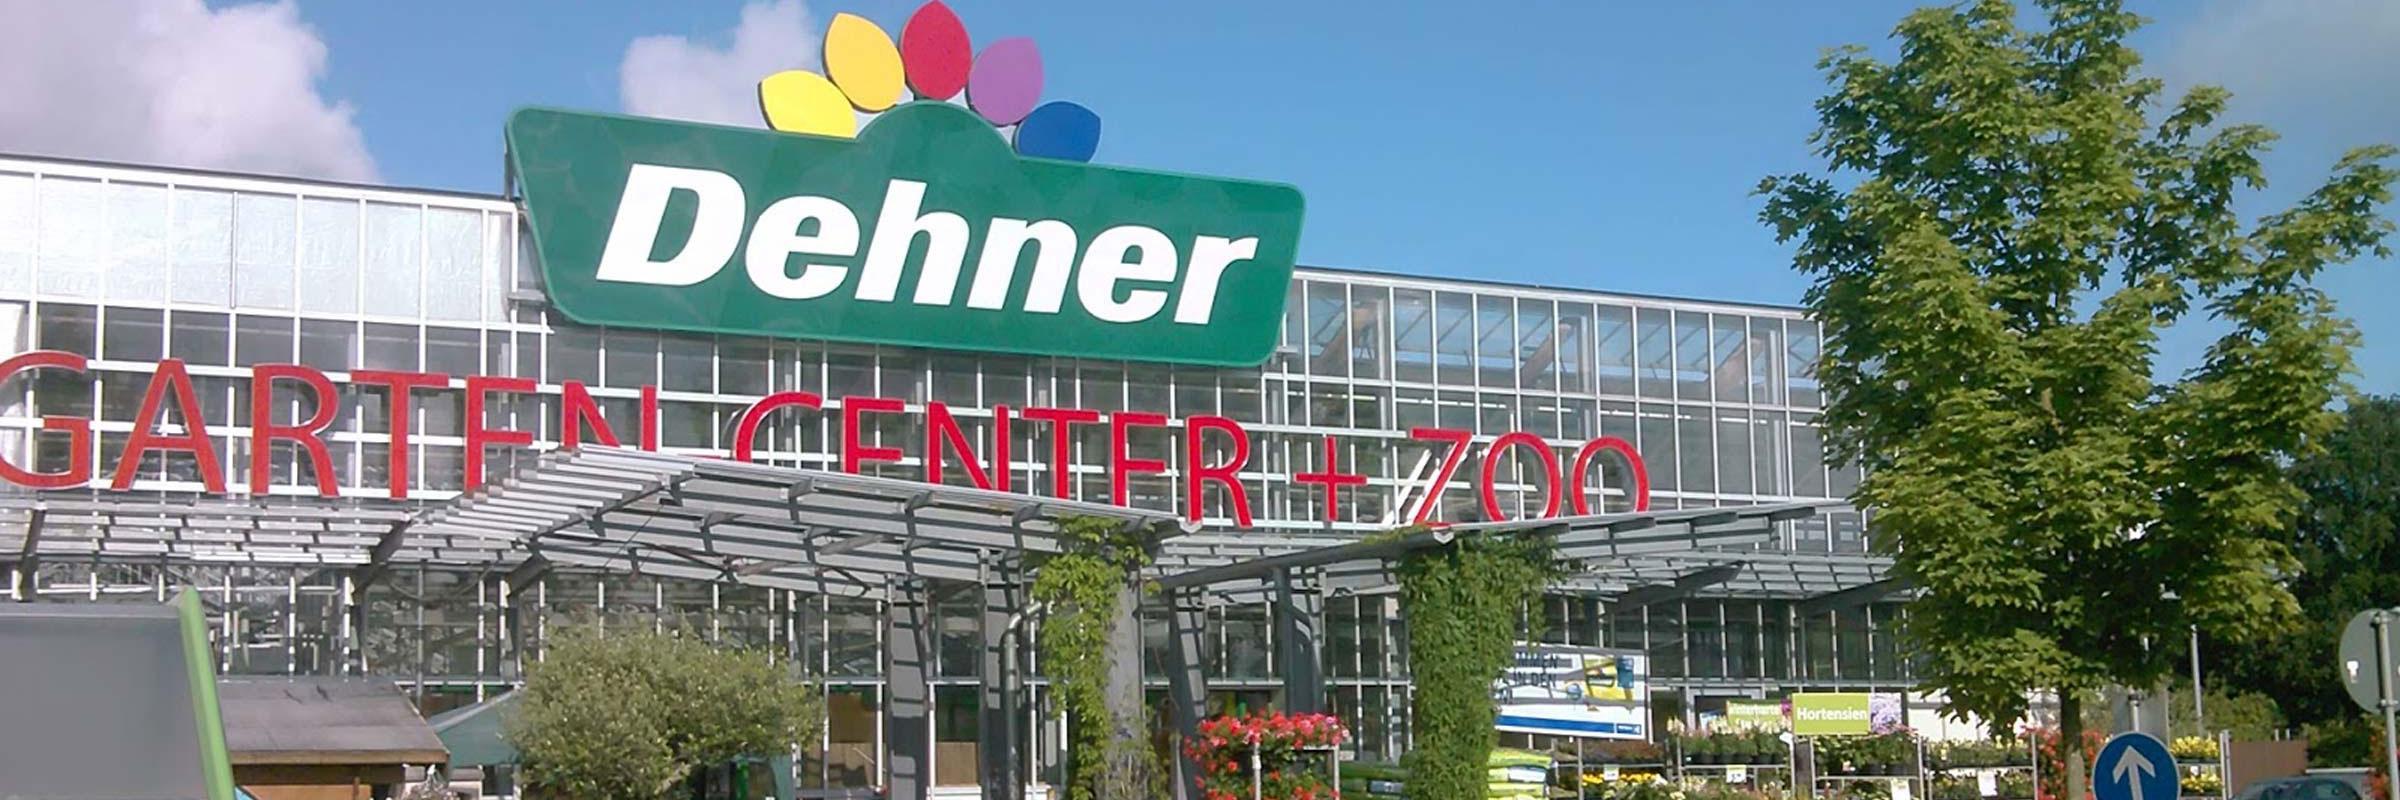 Dehner Garten Center In Bonningstedt Dehner